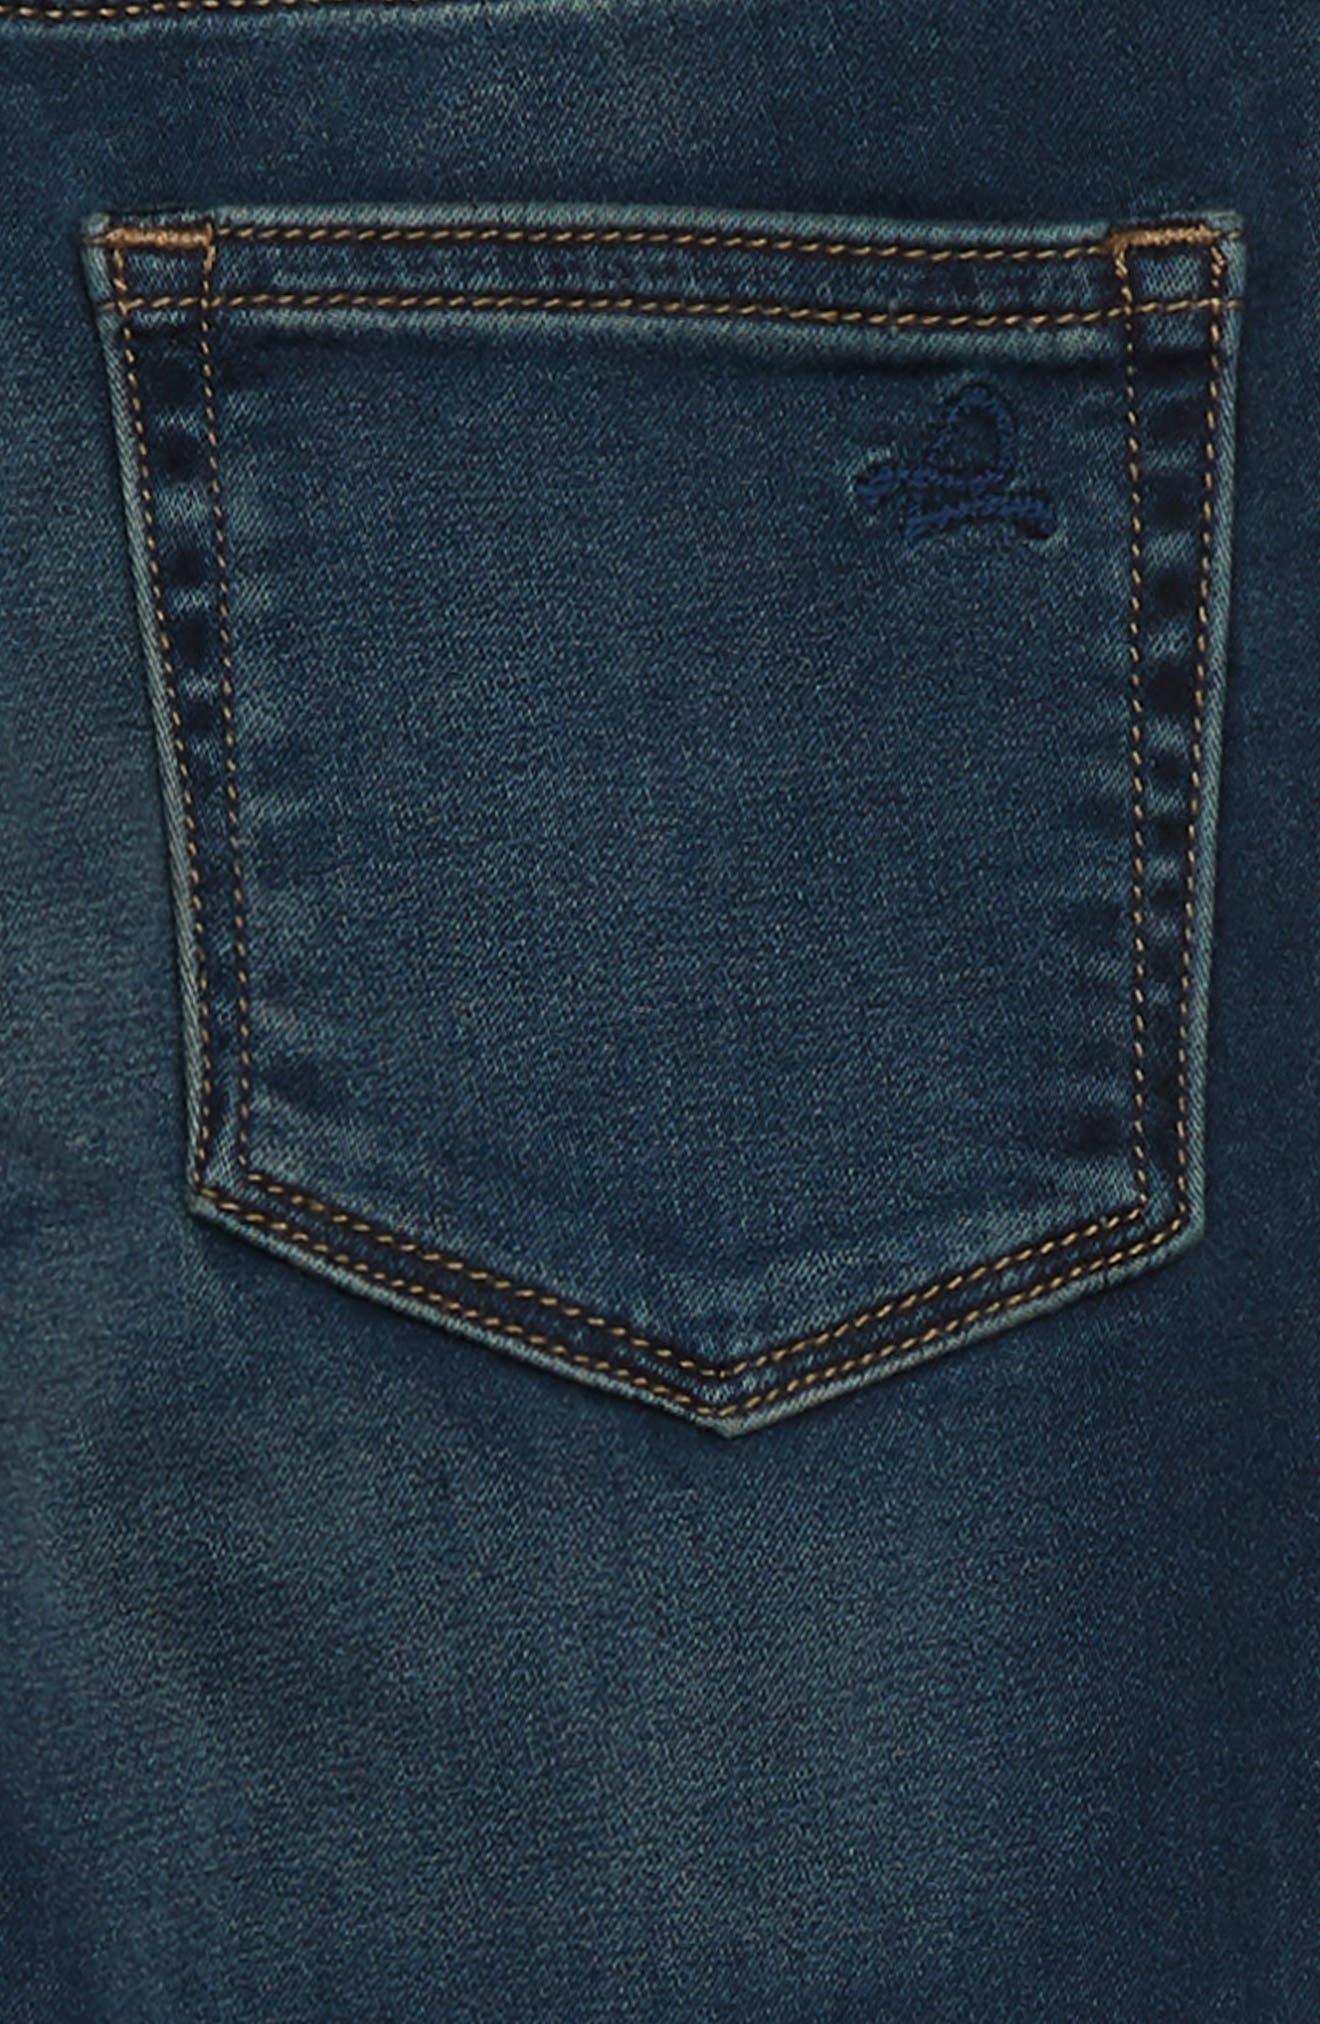 Brady Slim Fit Jeans,                             Alternate thumbnail 3, color,                             405